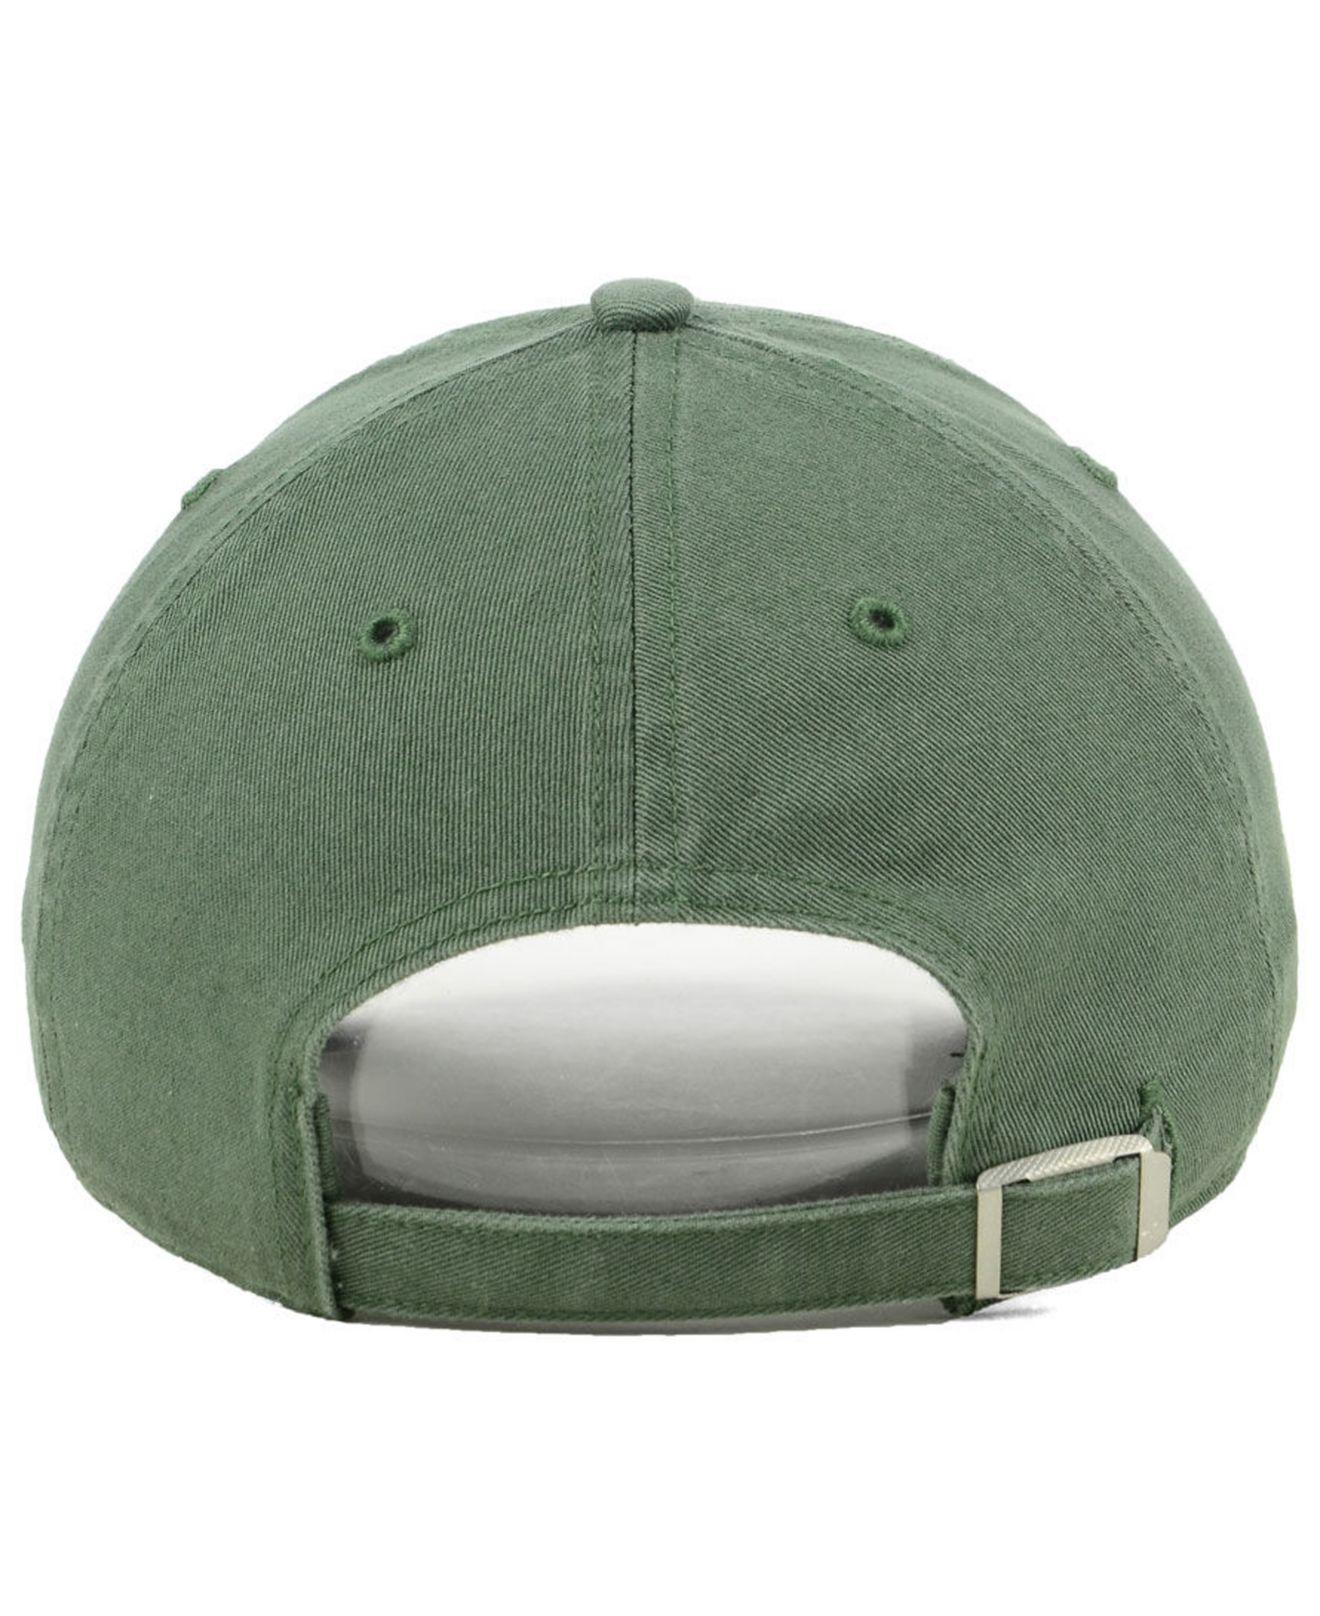 sale retailer 263a0 07164 ... sale 47 brand green san francisco 49ers moss glitta clean up cap lyst.  view fullscreen